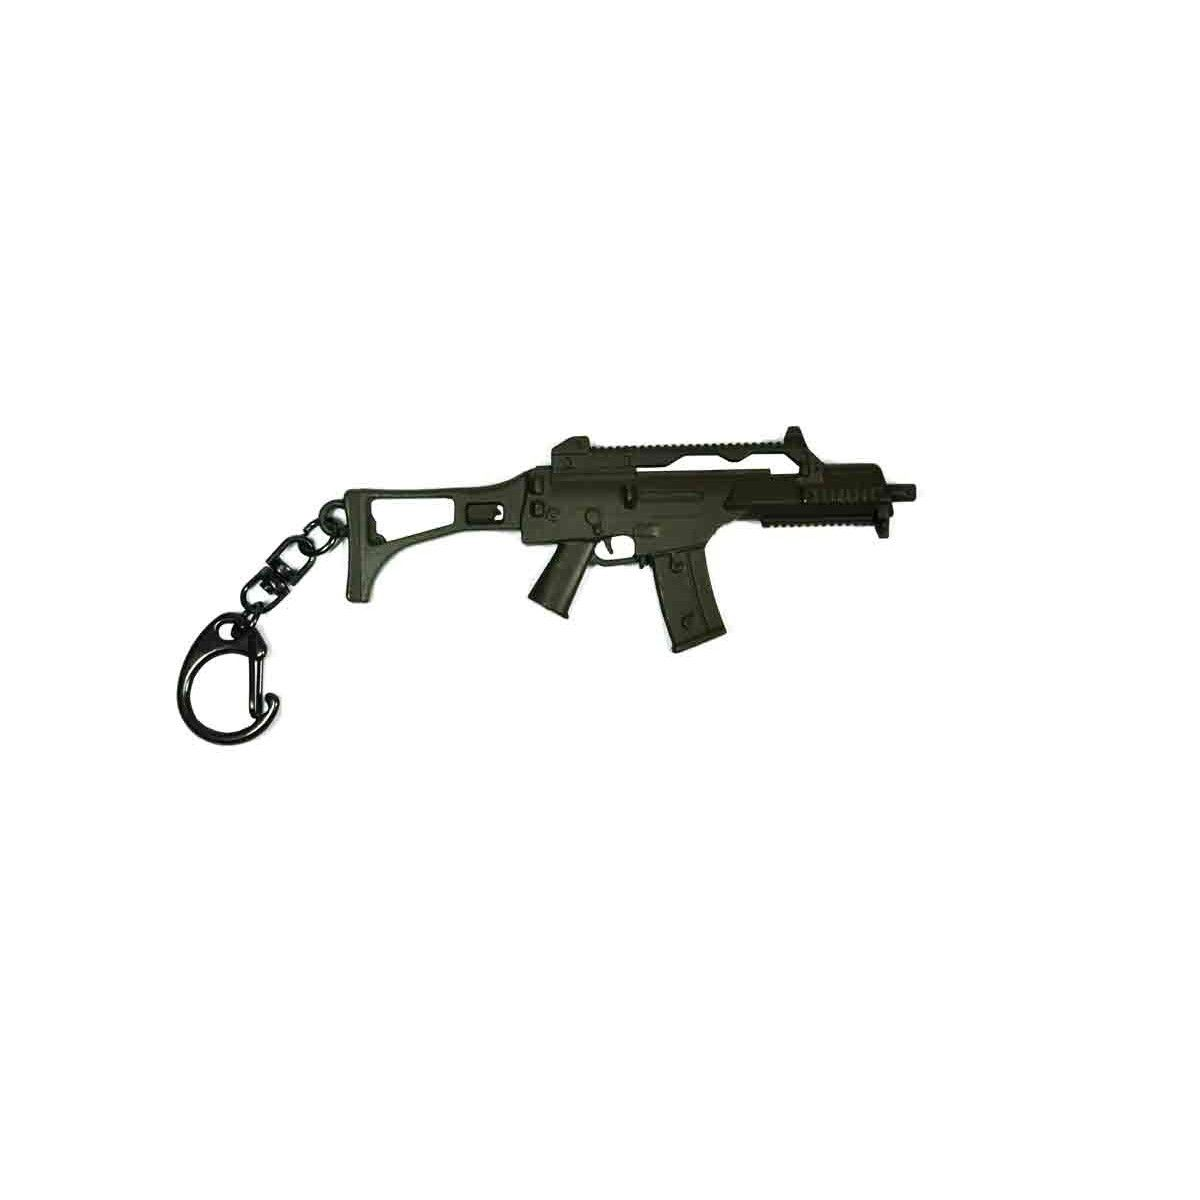 Chaveiro em Metal modelo Rifle G36 - Arsenal Guns